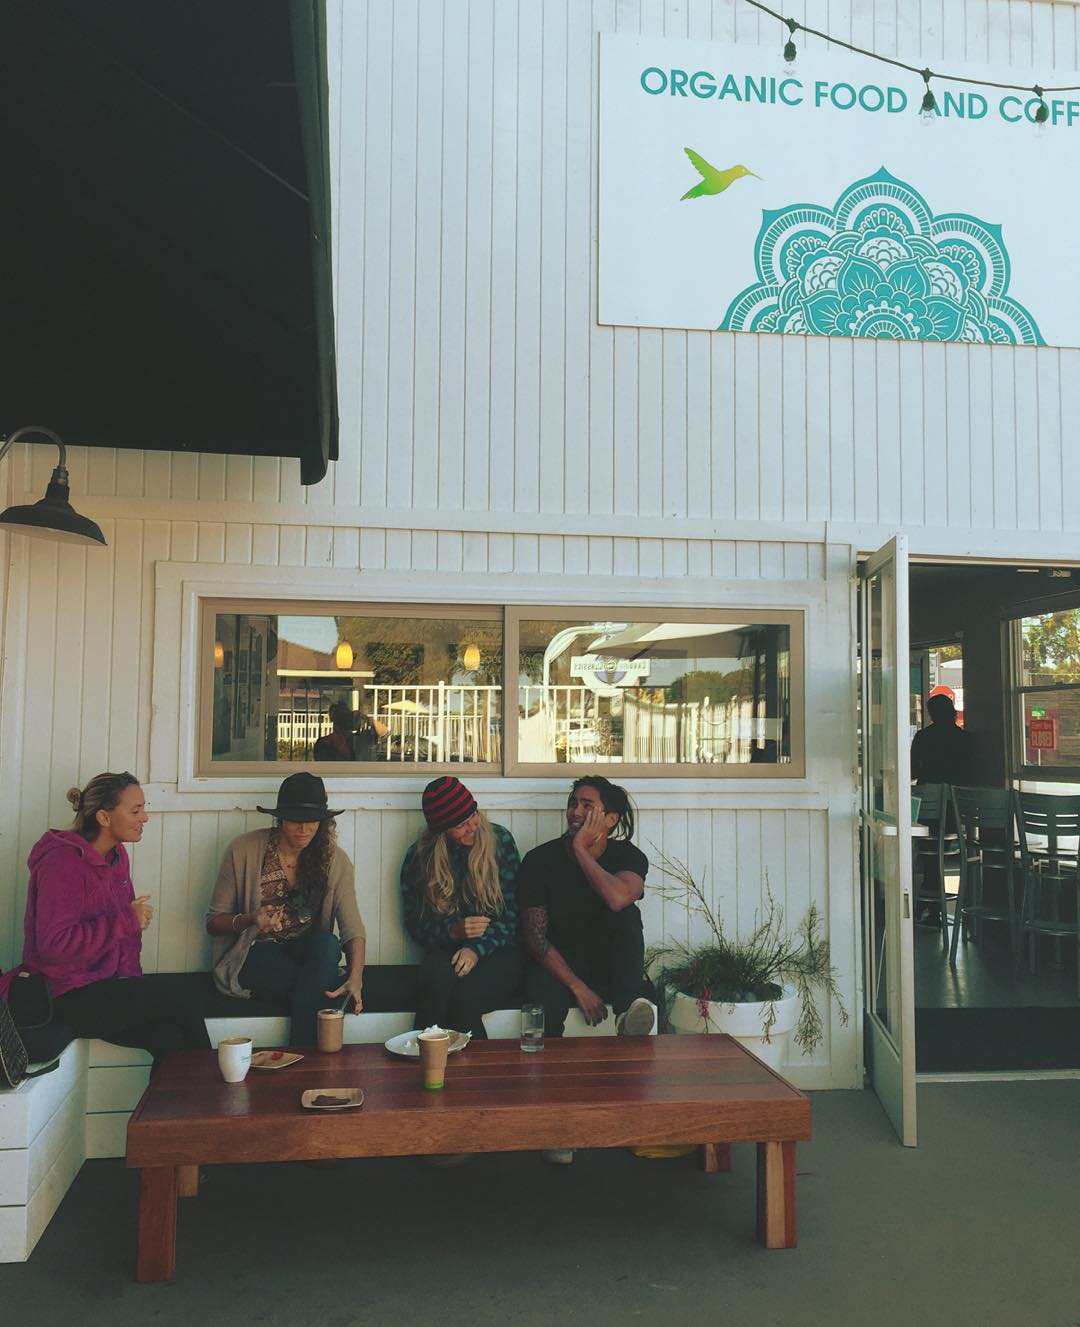 @goodonyaorganic, the best breakfast+coffee+lunch spot in all of Encinitas.